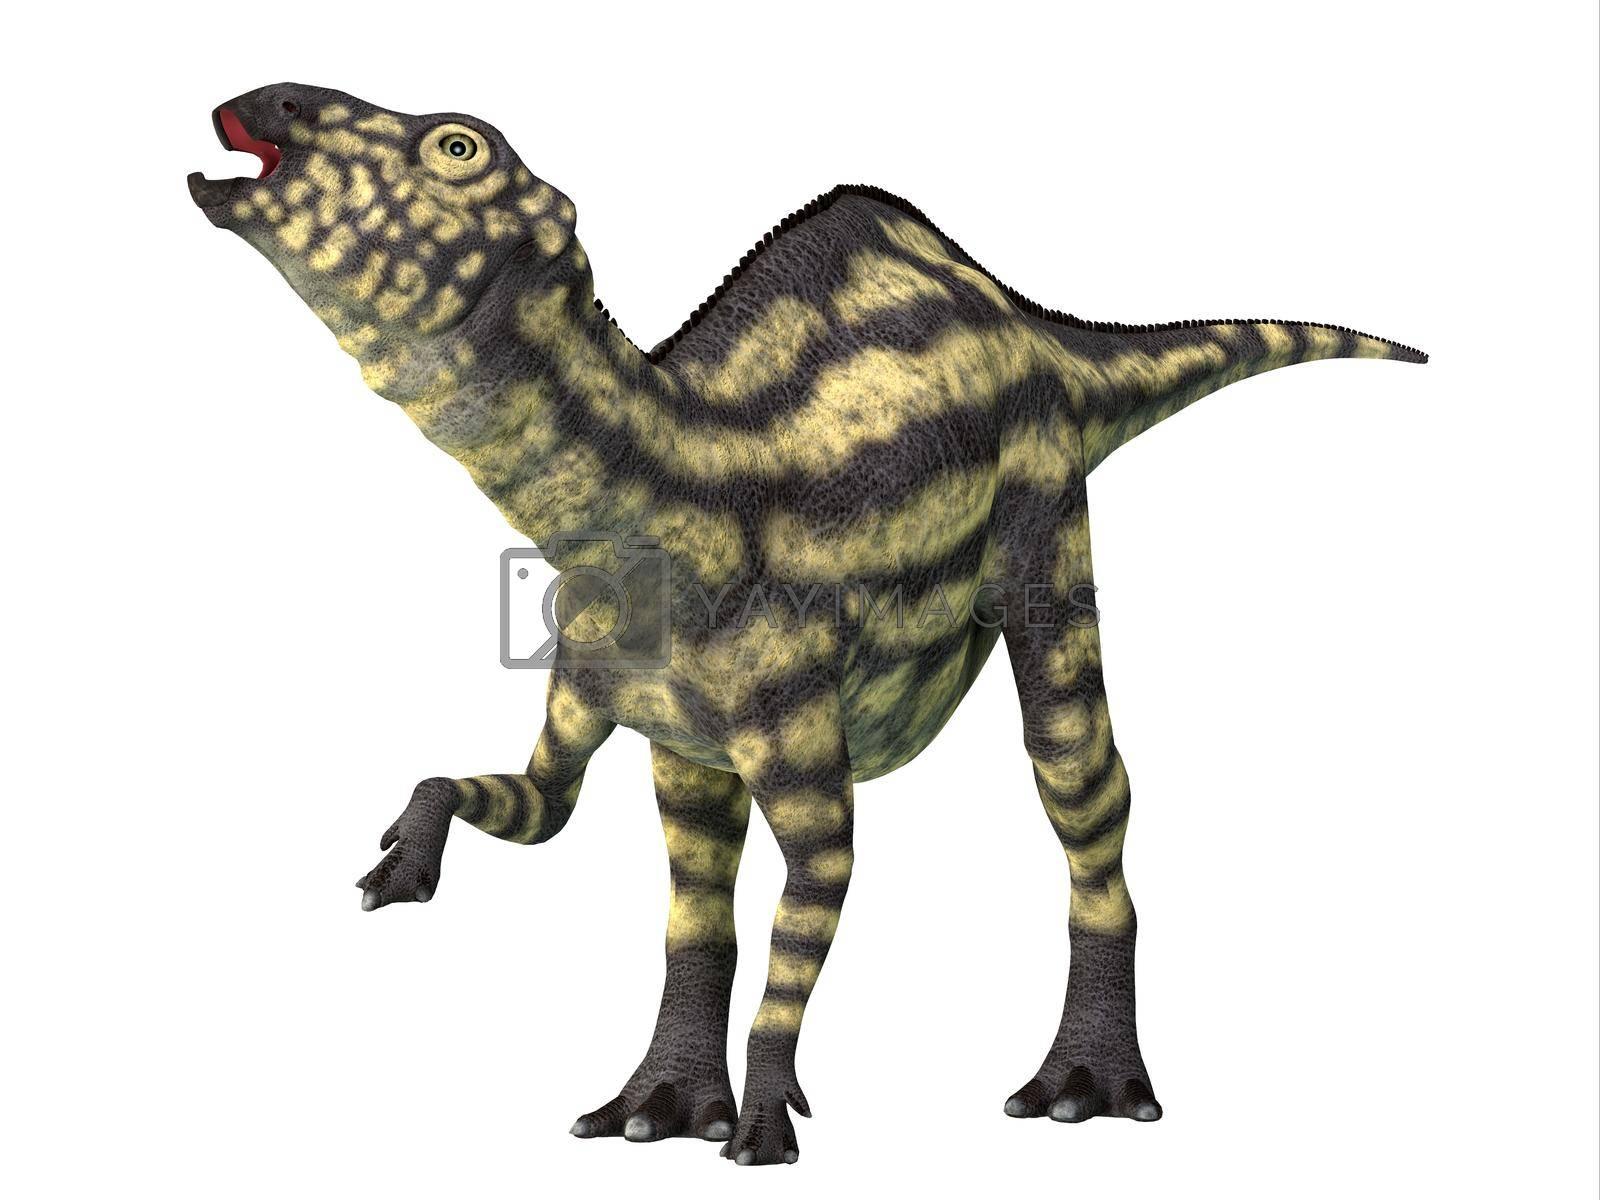 Royalty free image of Maiasaura Juvenile Dinosaur by Catmando